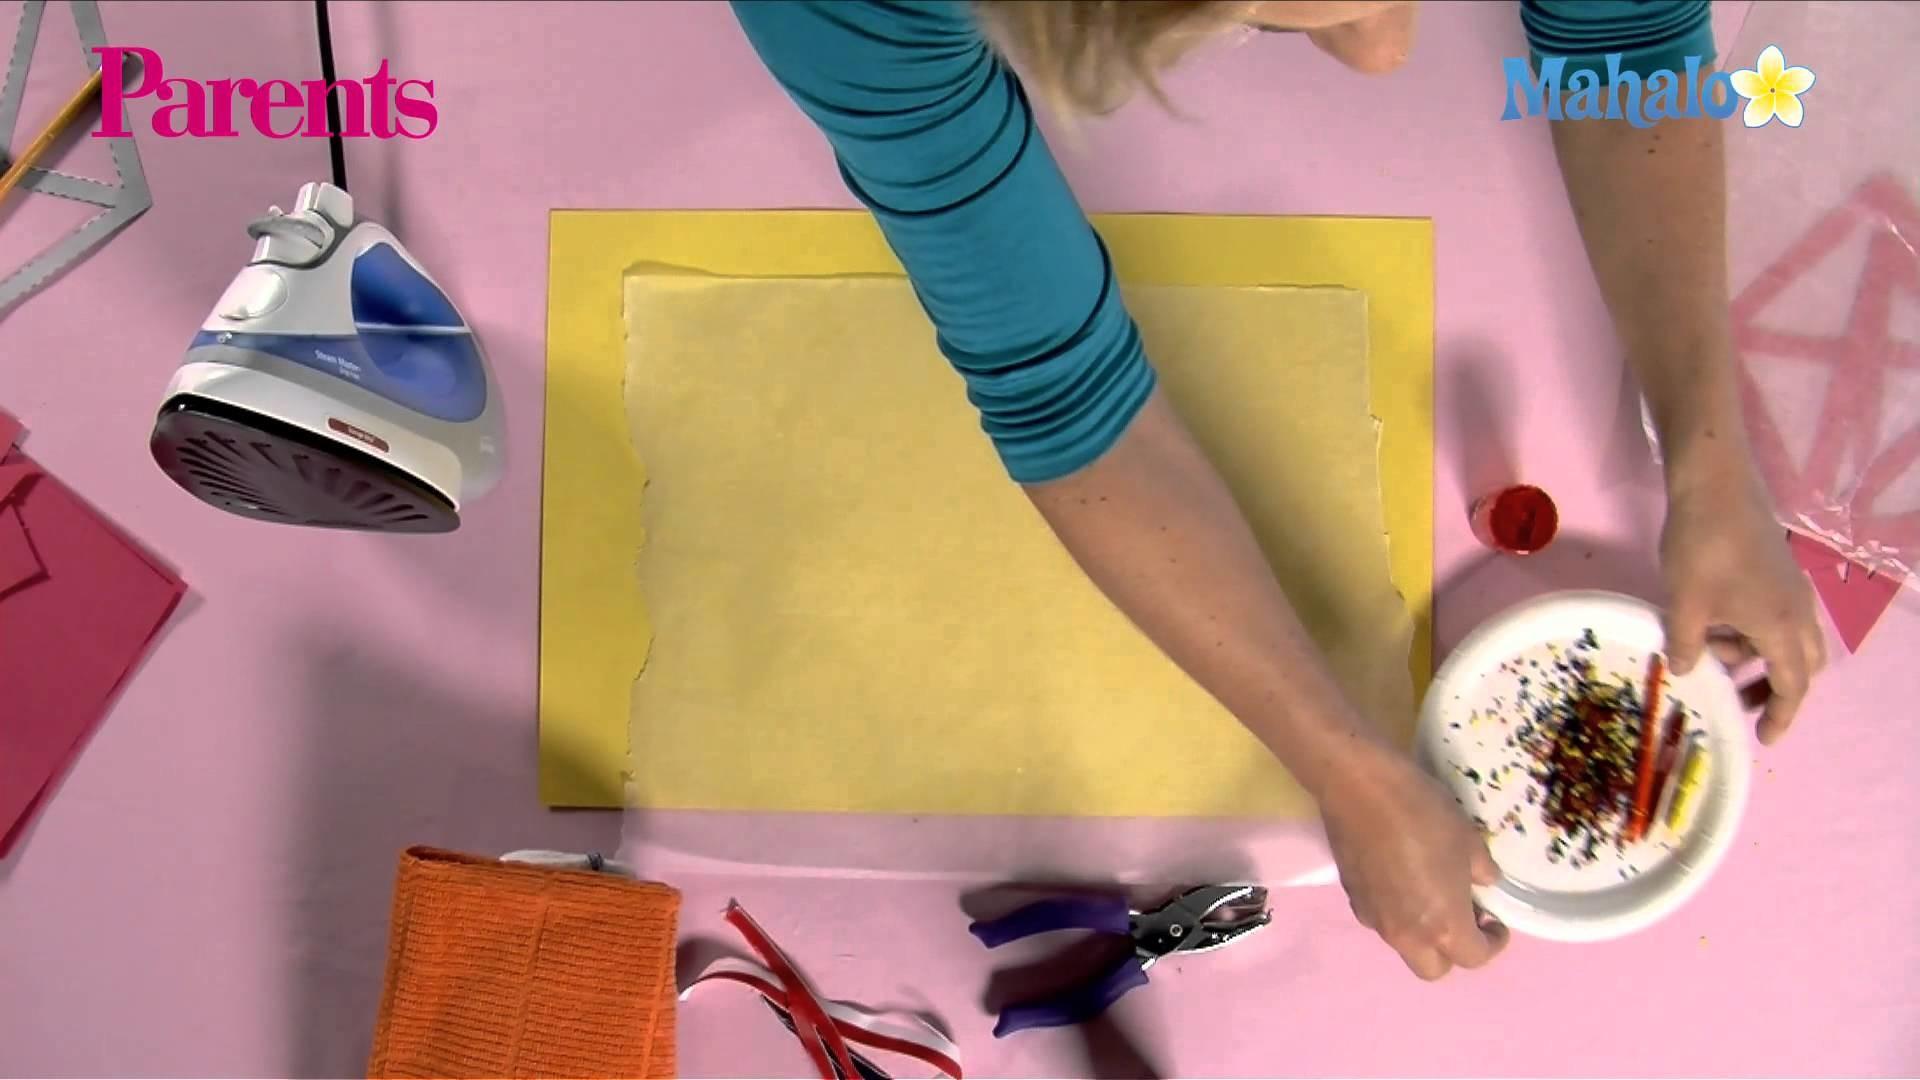 How to Make a Wax Crayon Kite